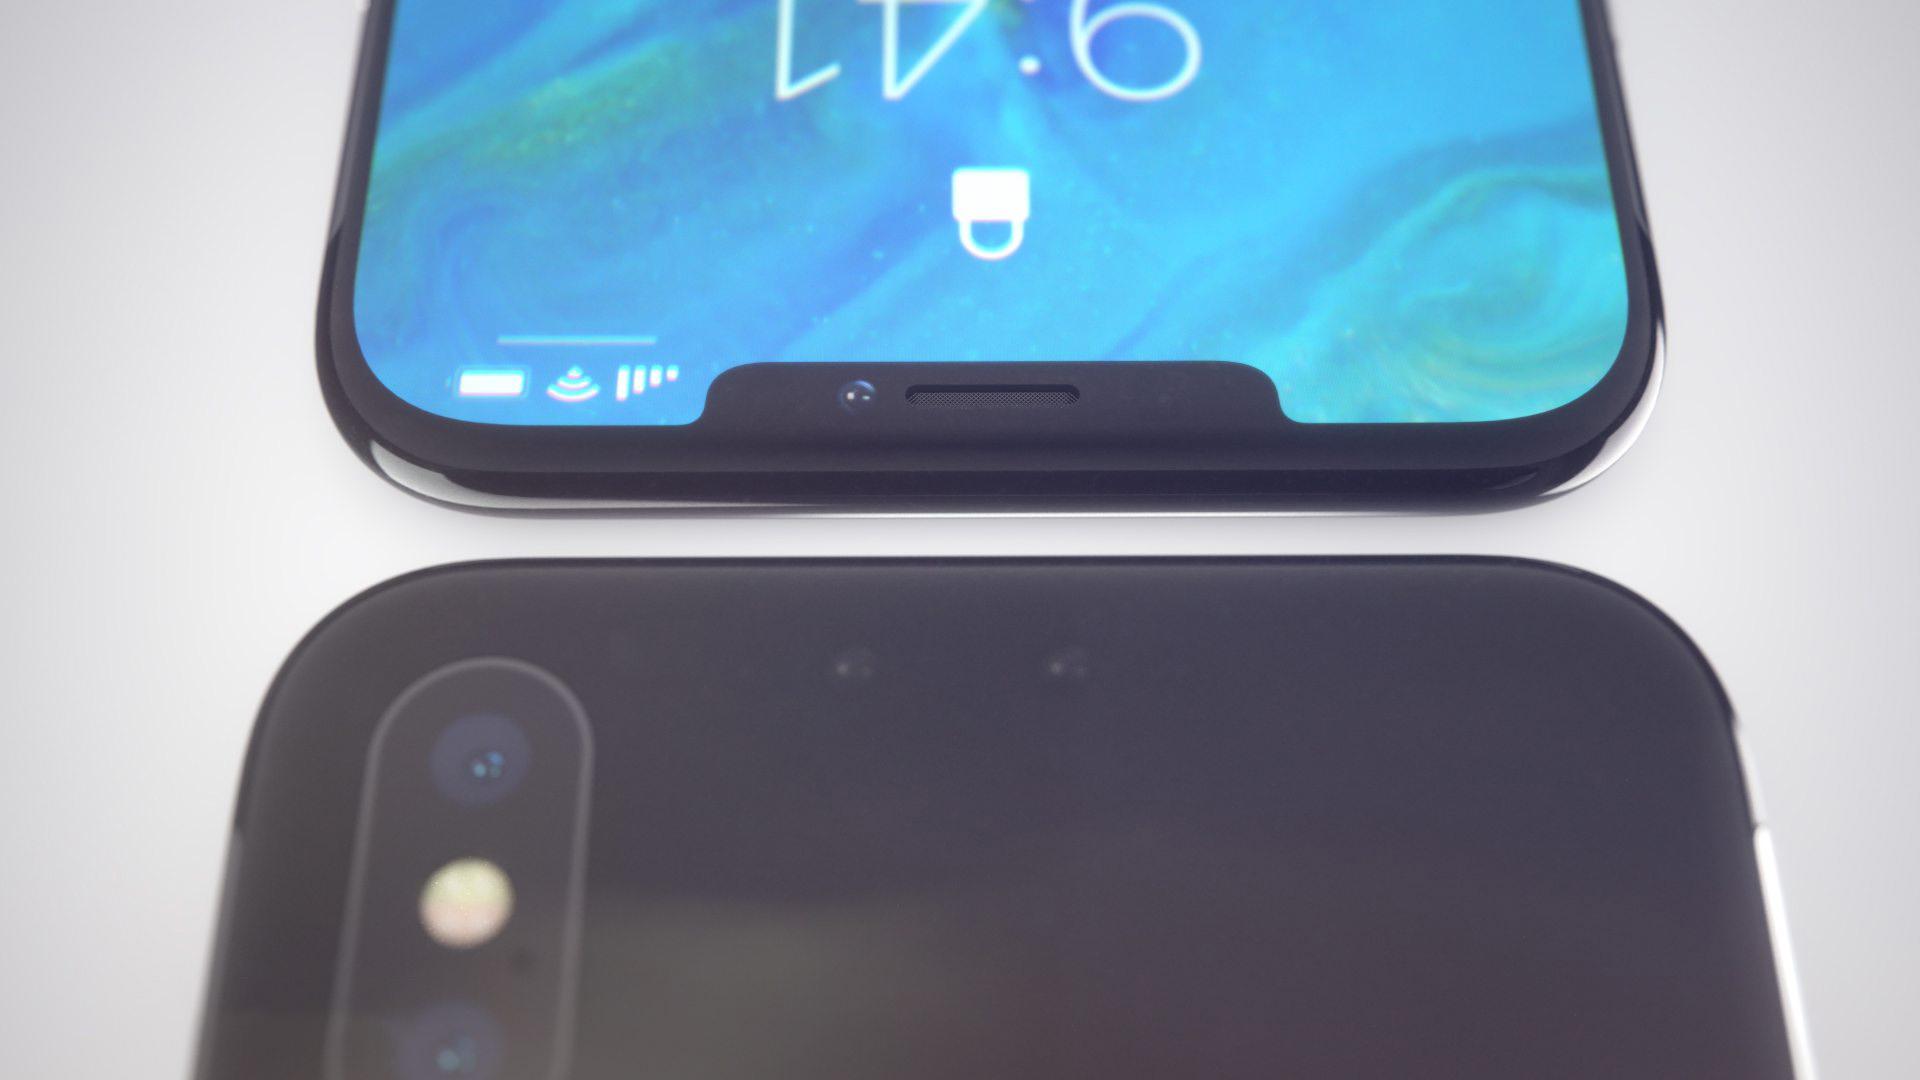 iPhone XS concept dual sim 5